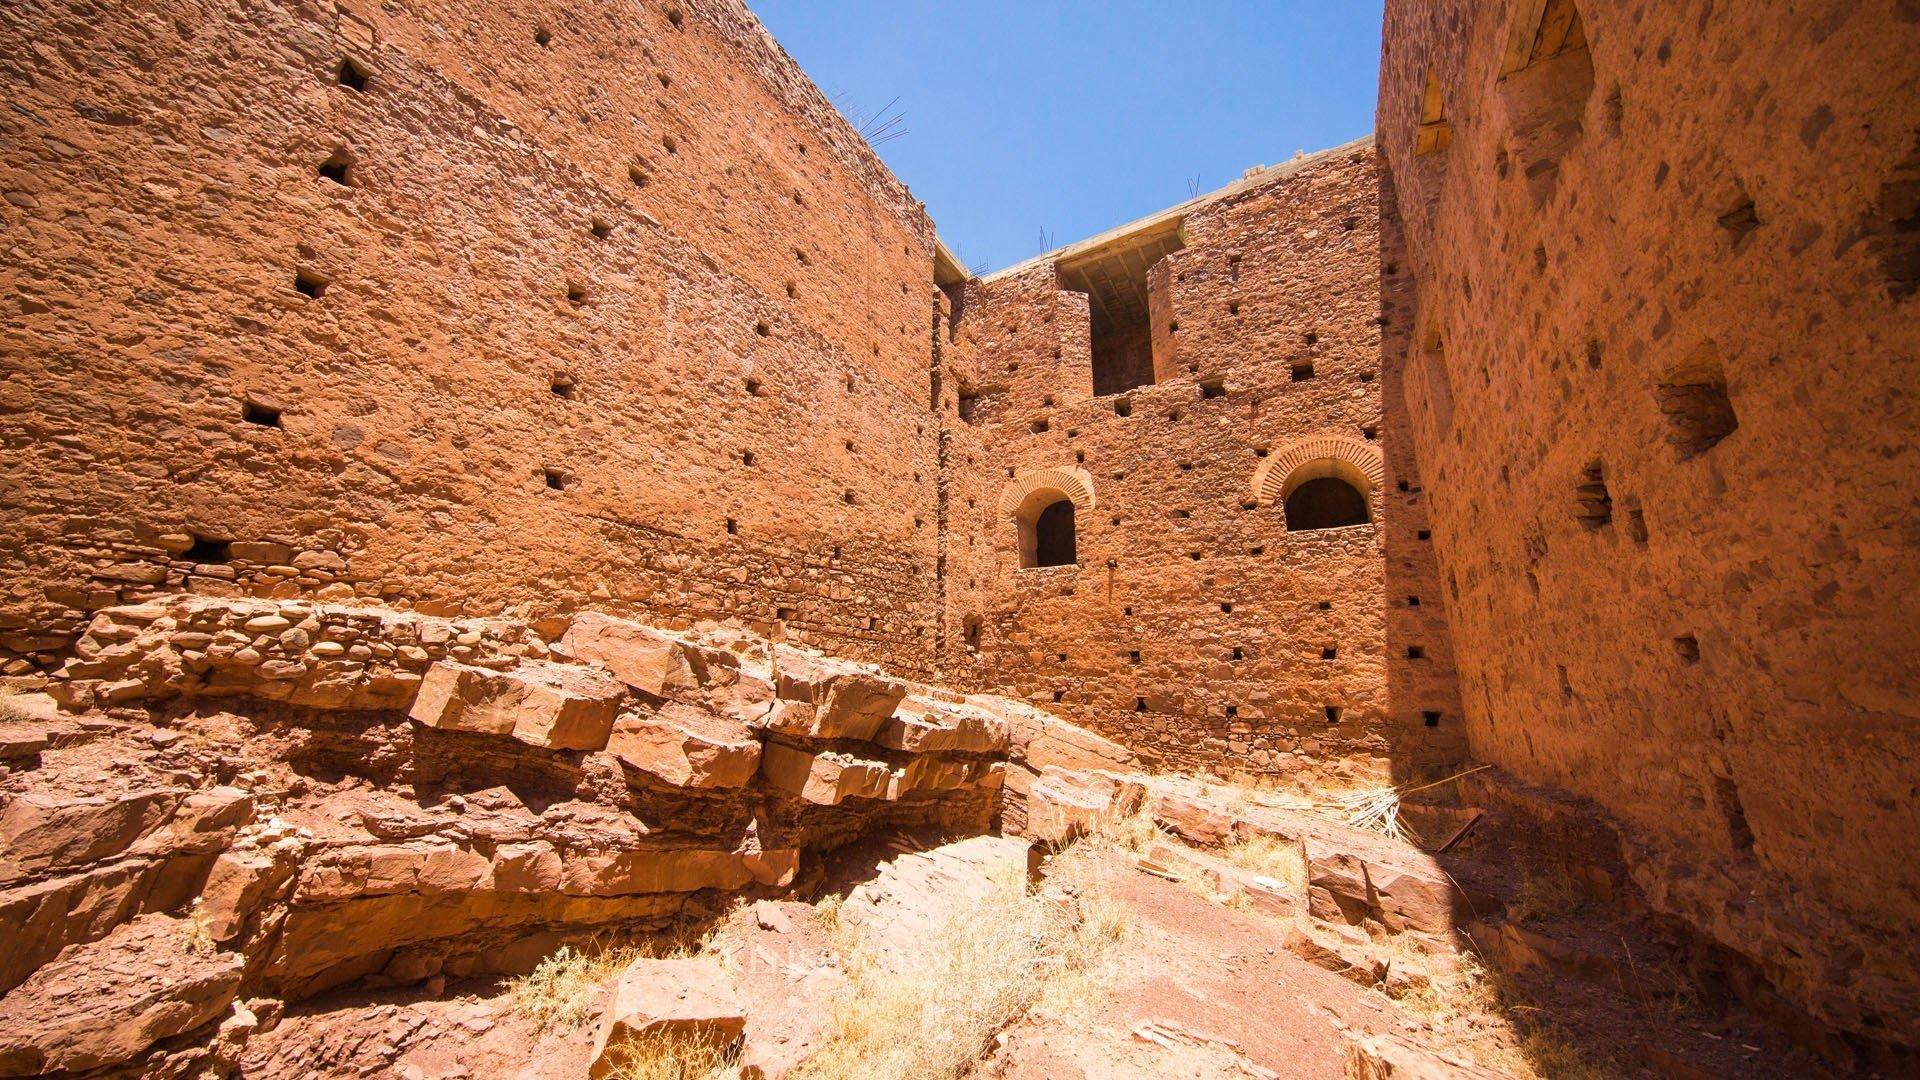 KPPM00974: Kasbah Tagountaft Luxury Villa Marrakech Morocco